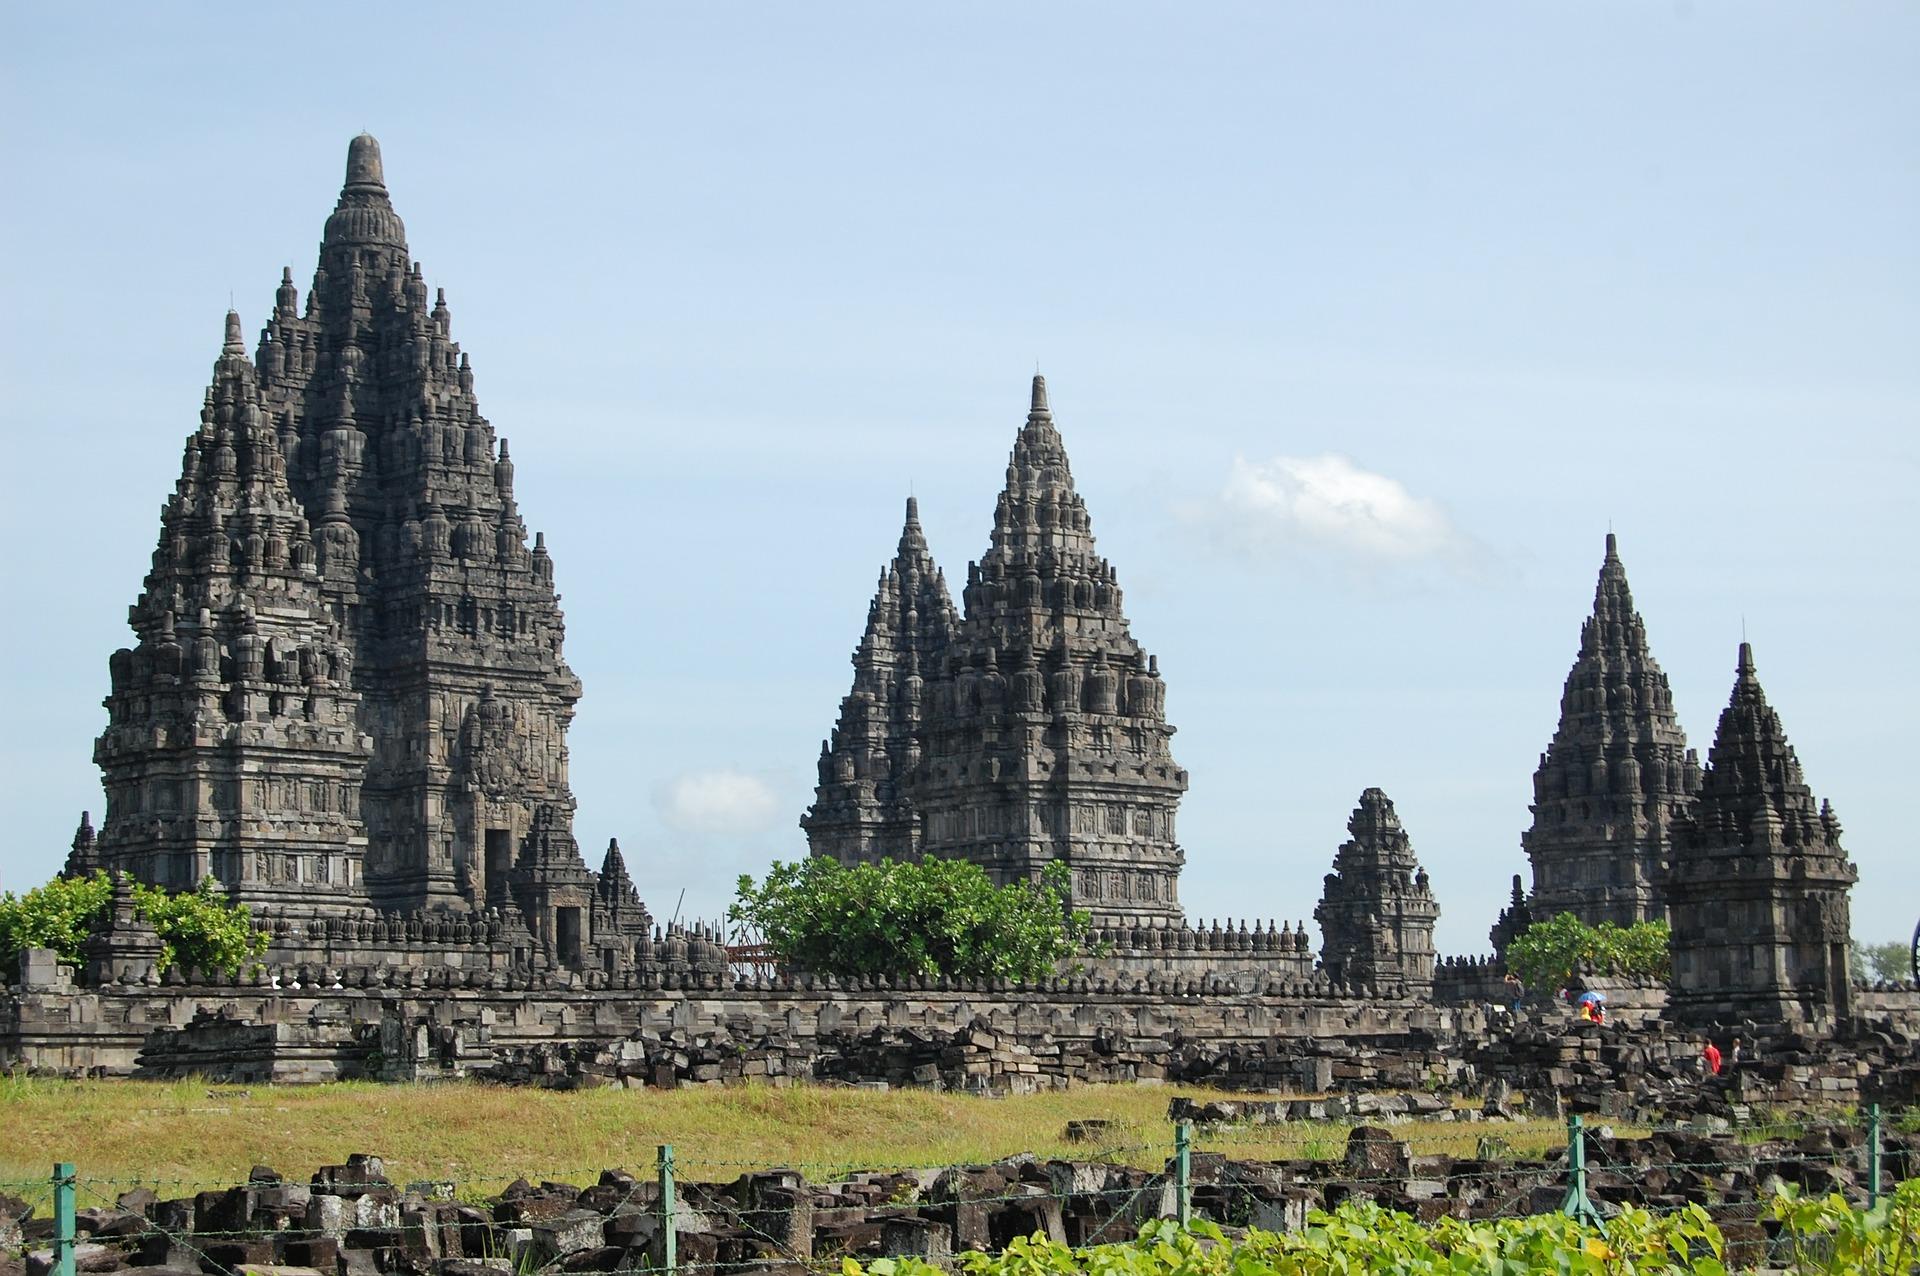 Temple - Dedication to Trimurti